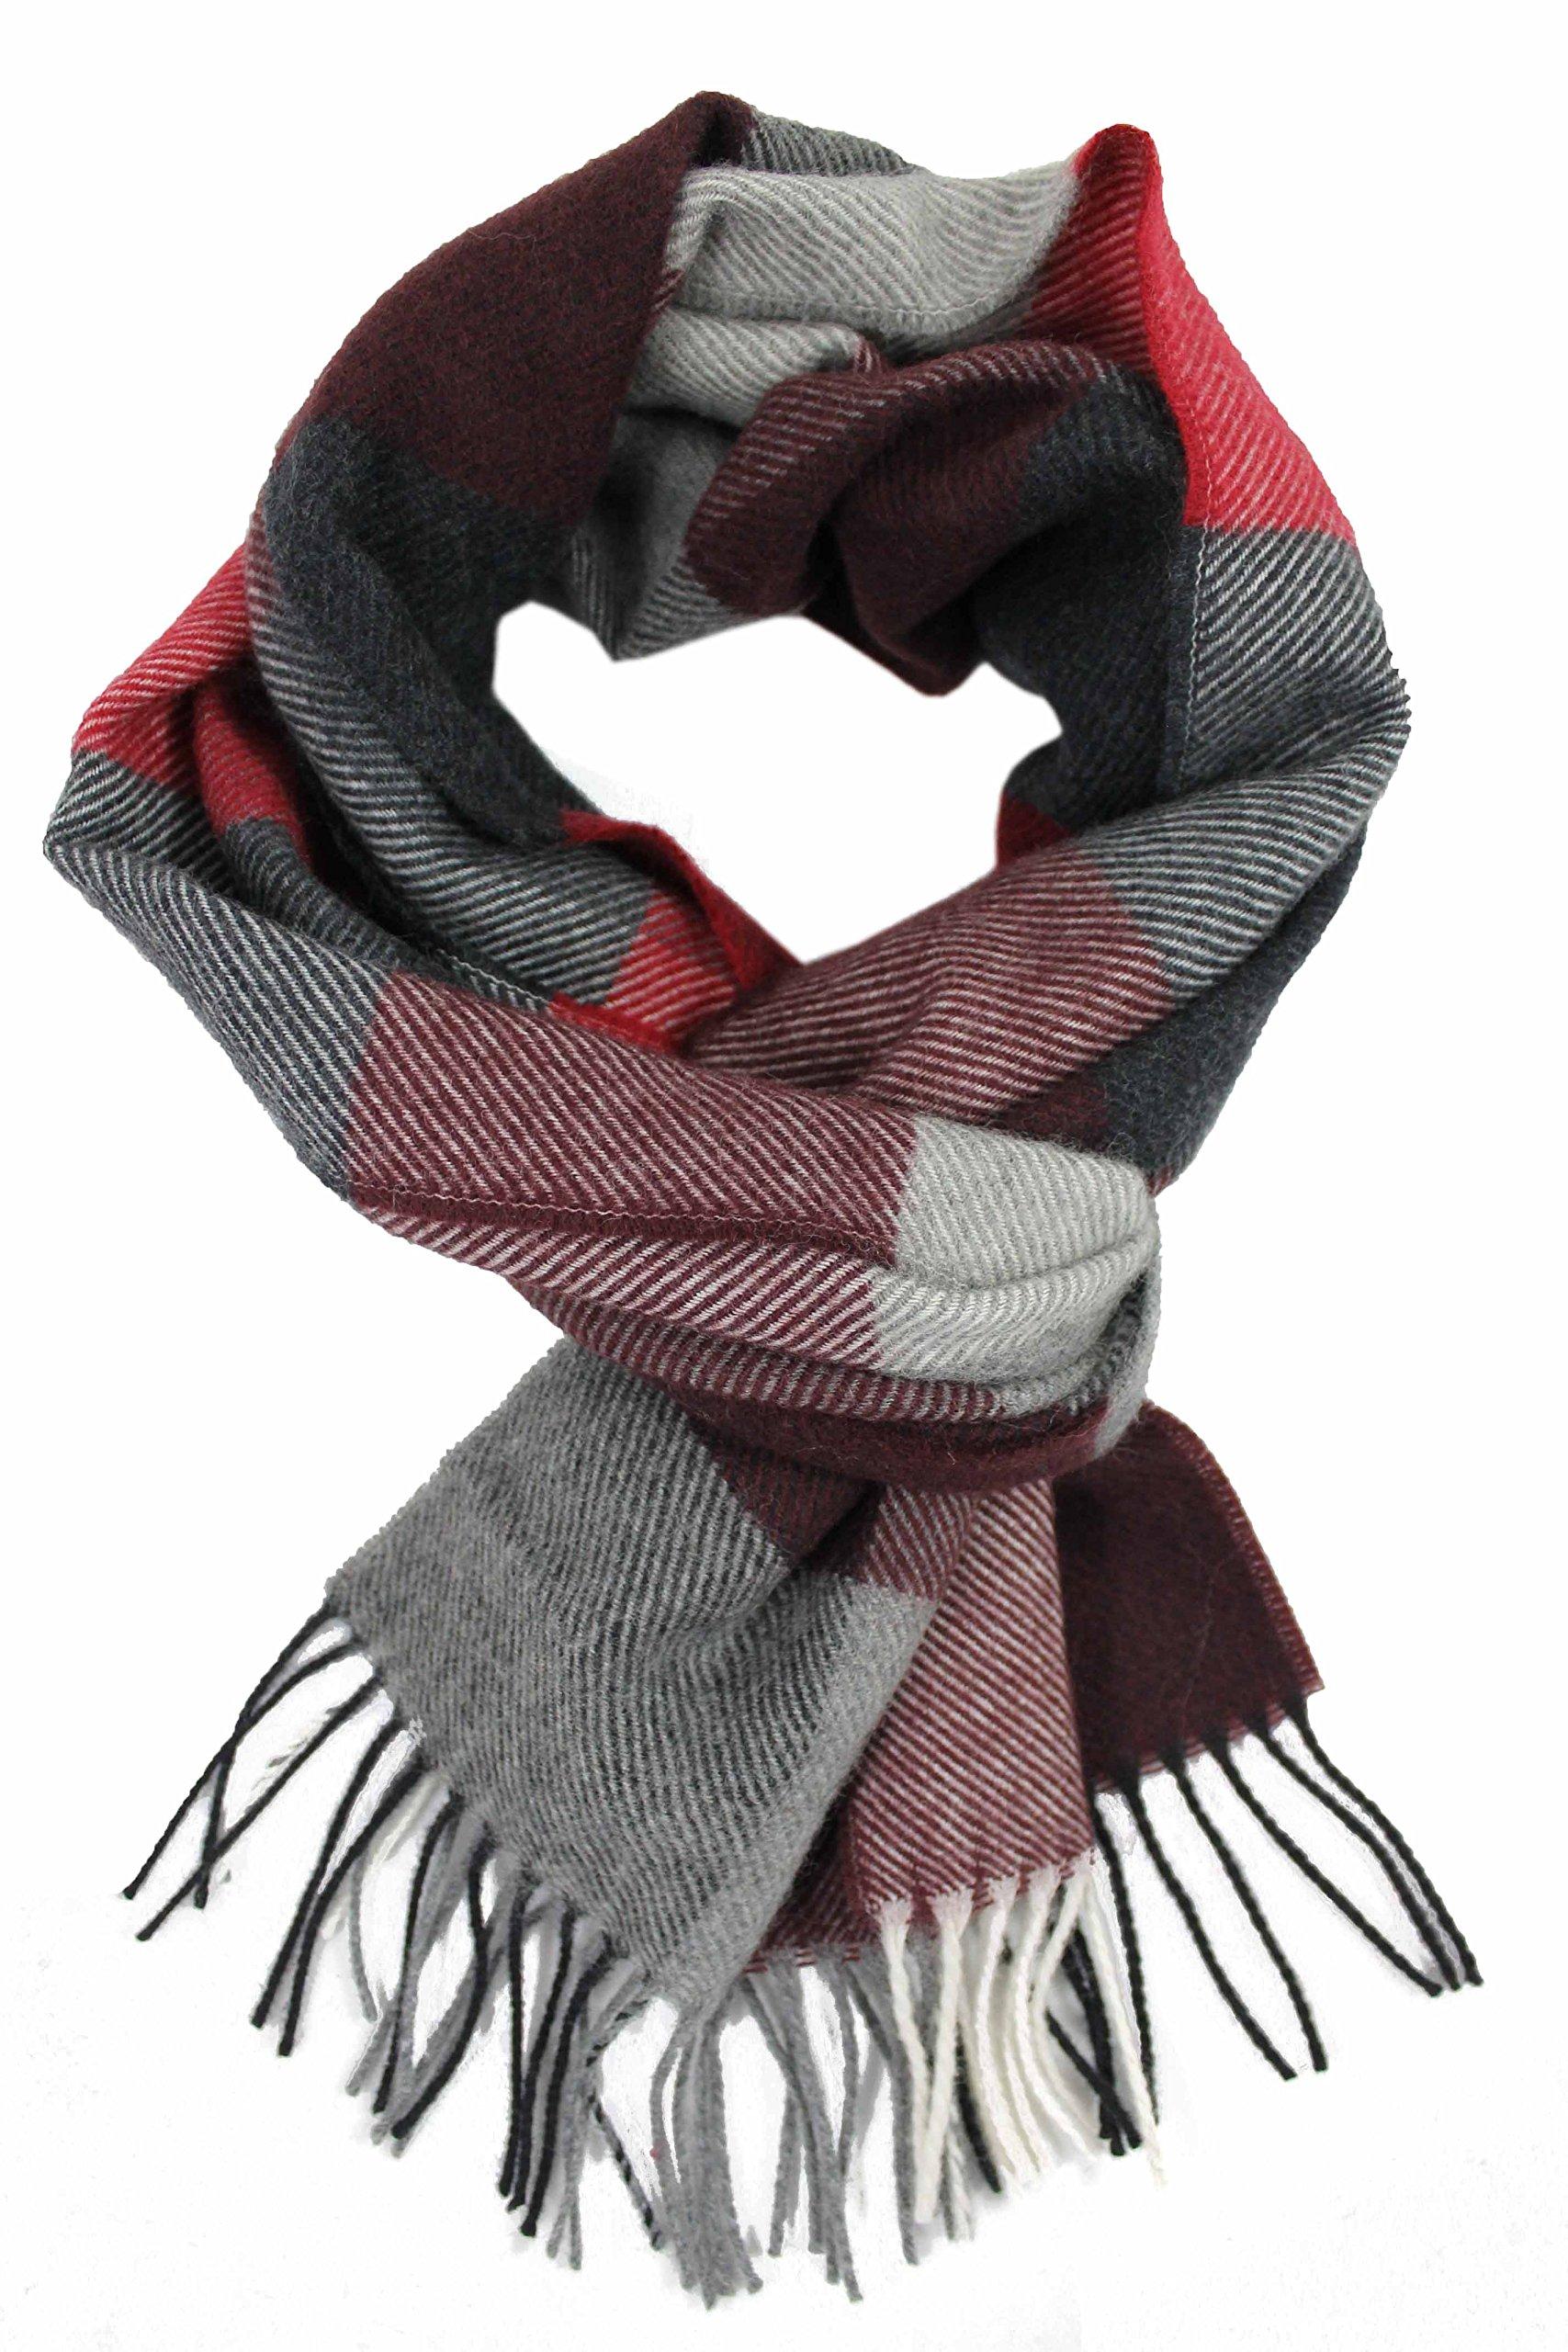 Men's scarf - Neckerchief fine wool scarf - red gray plaid